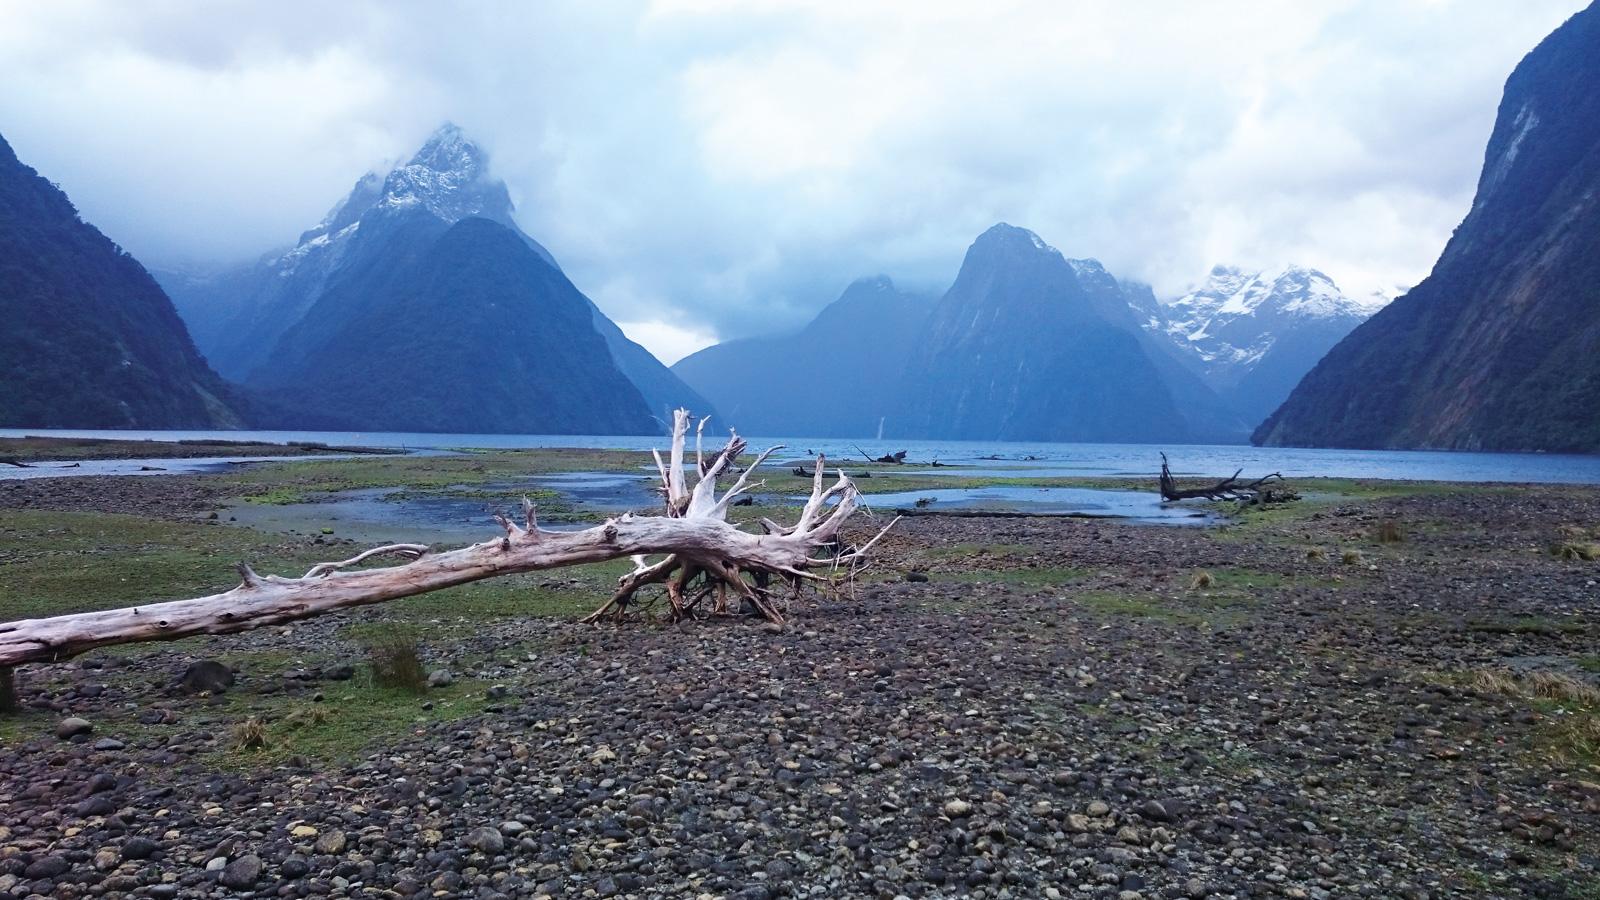 Neuseeland Aktivreise allumfassend Gruppenreise traveljunkies